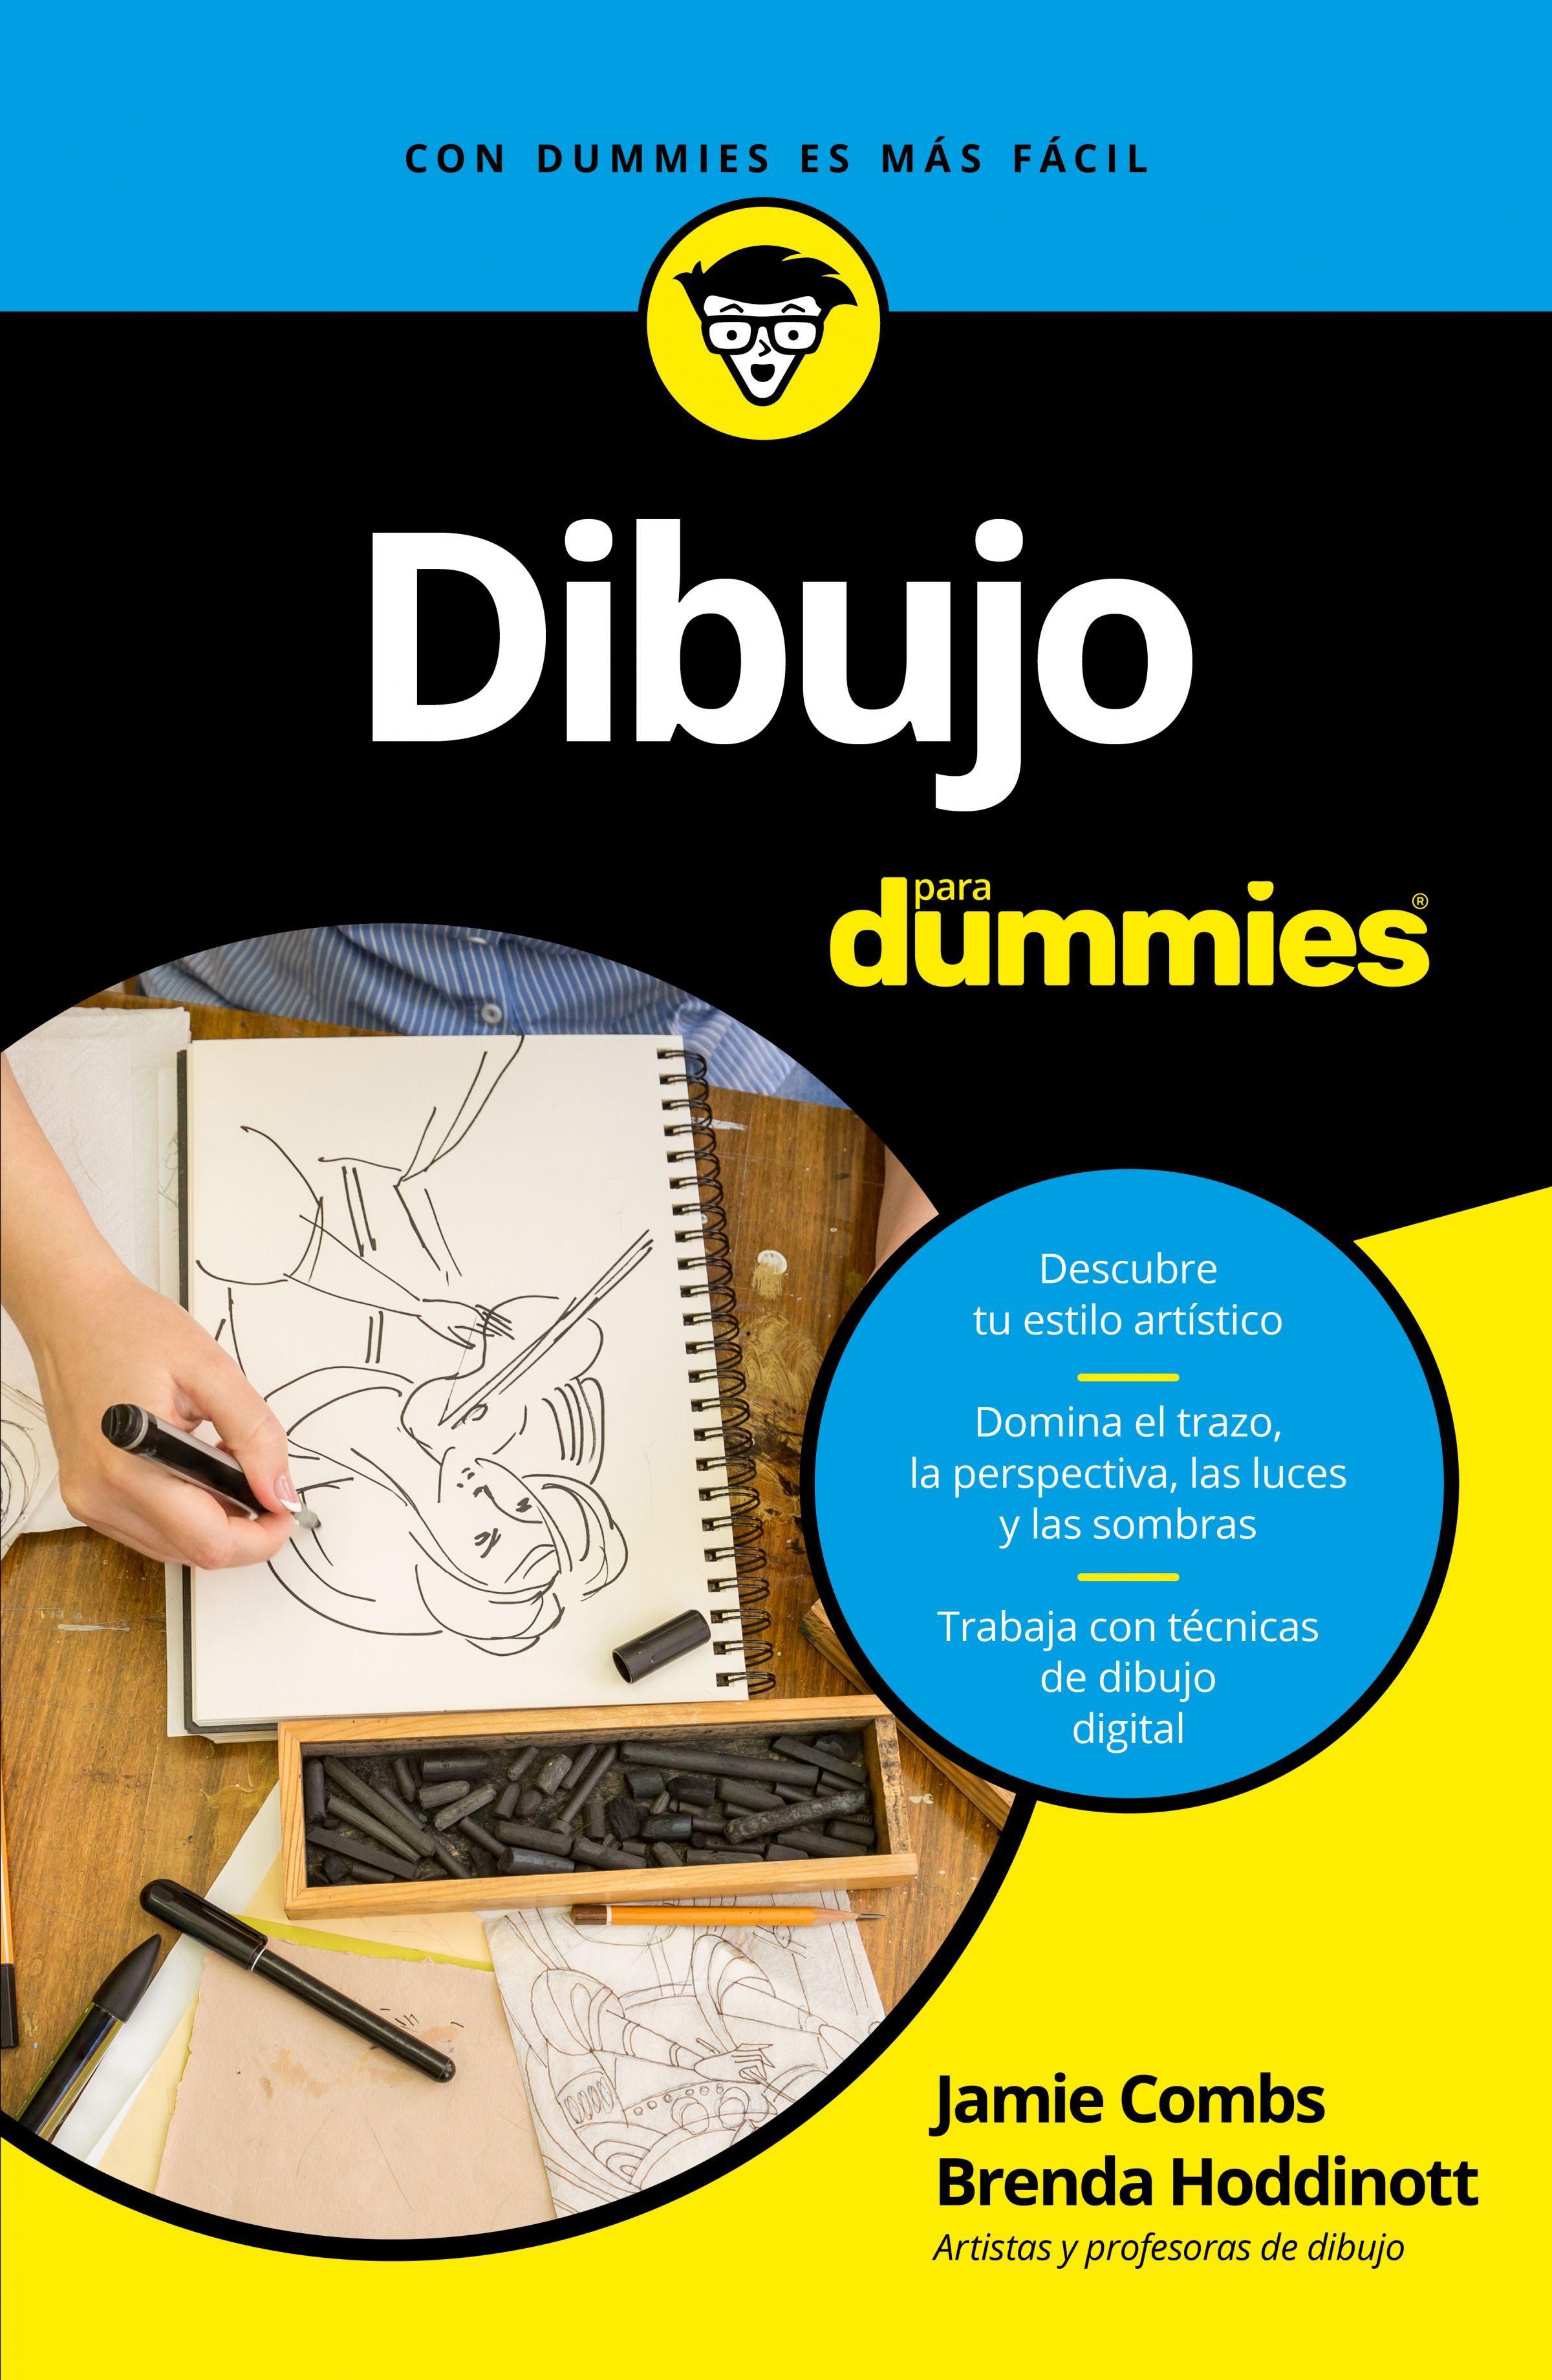 DIBUJO PARA DUMMIES EBOOK  BRENDA HODDINOT  Descargar libro PDF